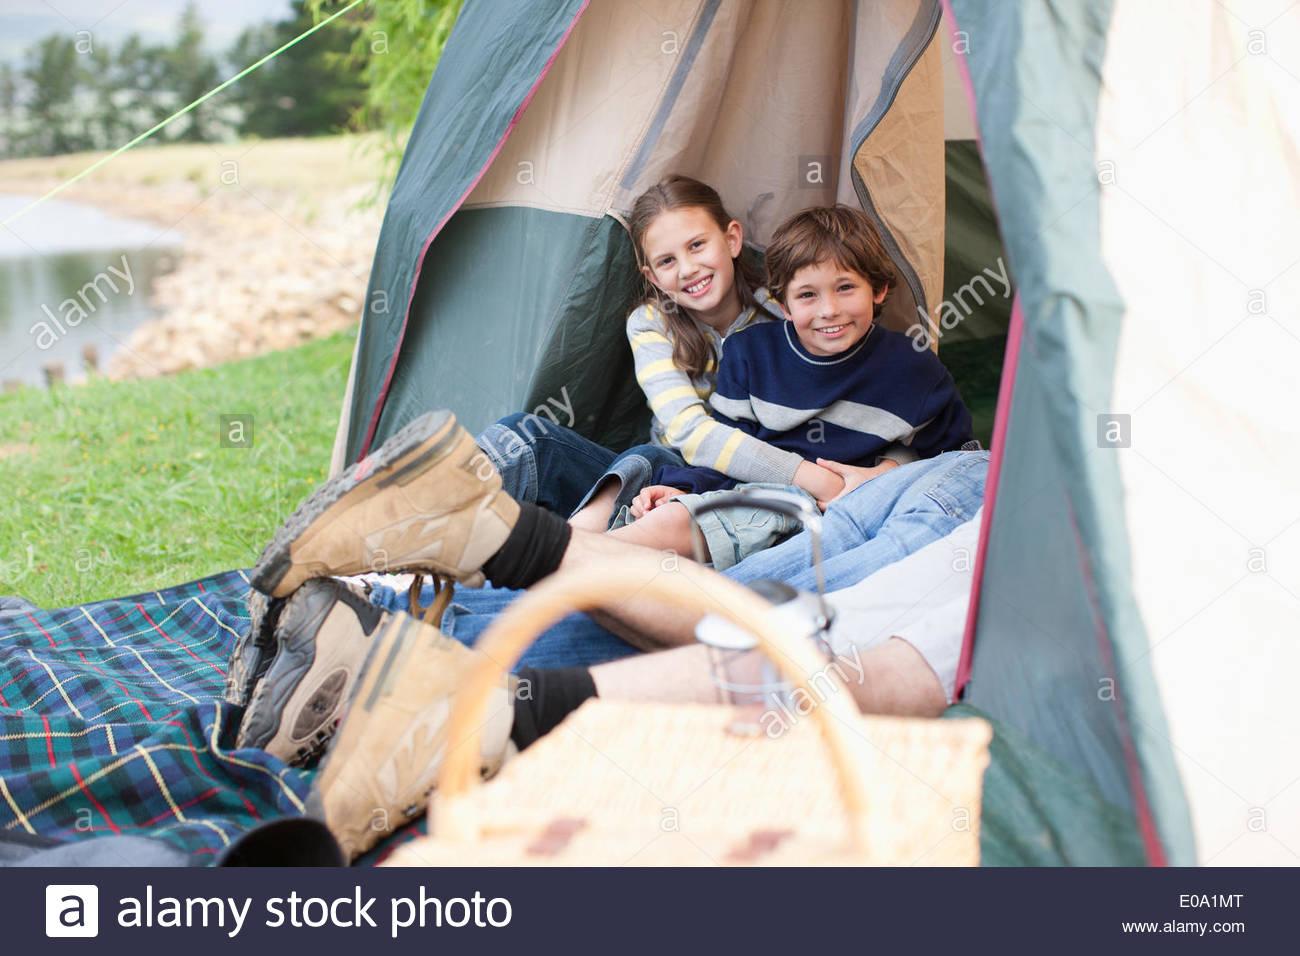 Family camping near lake - Stock Image